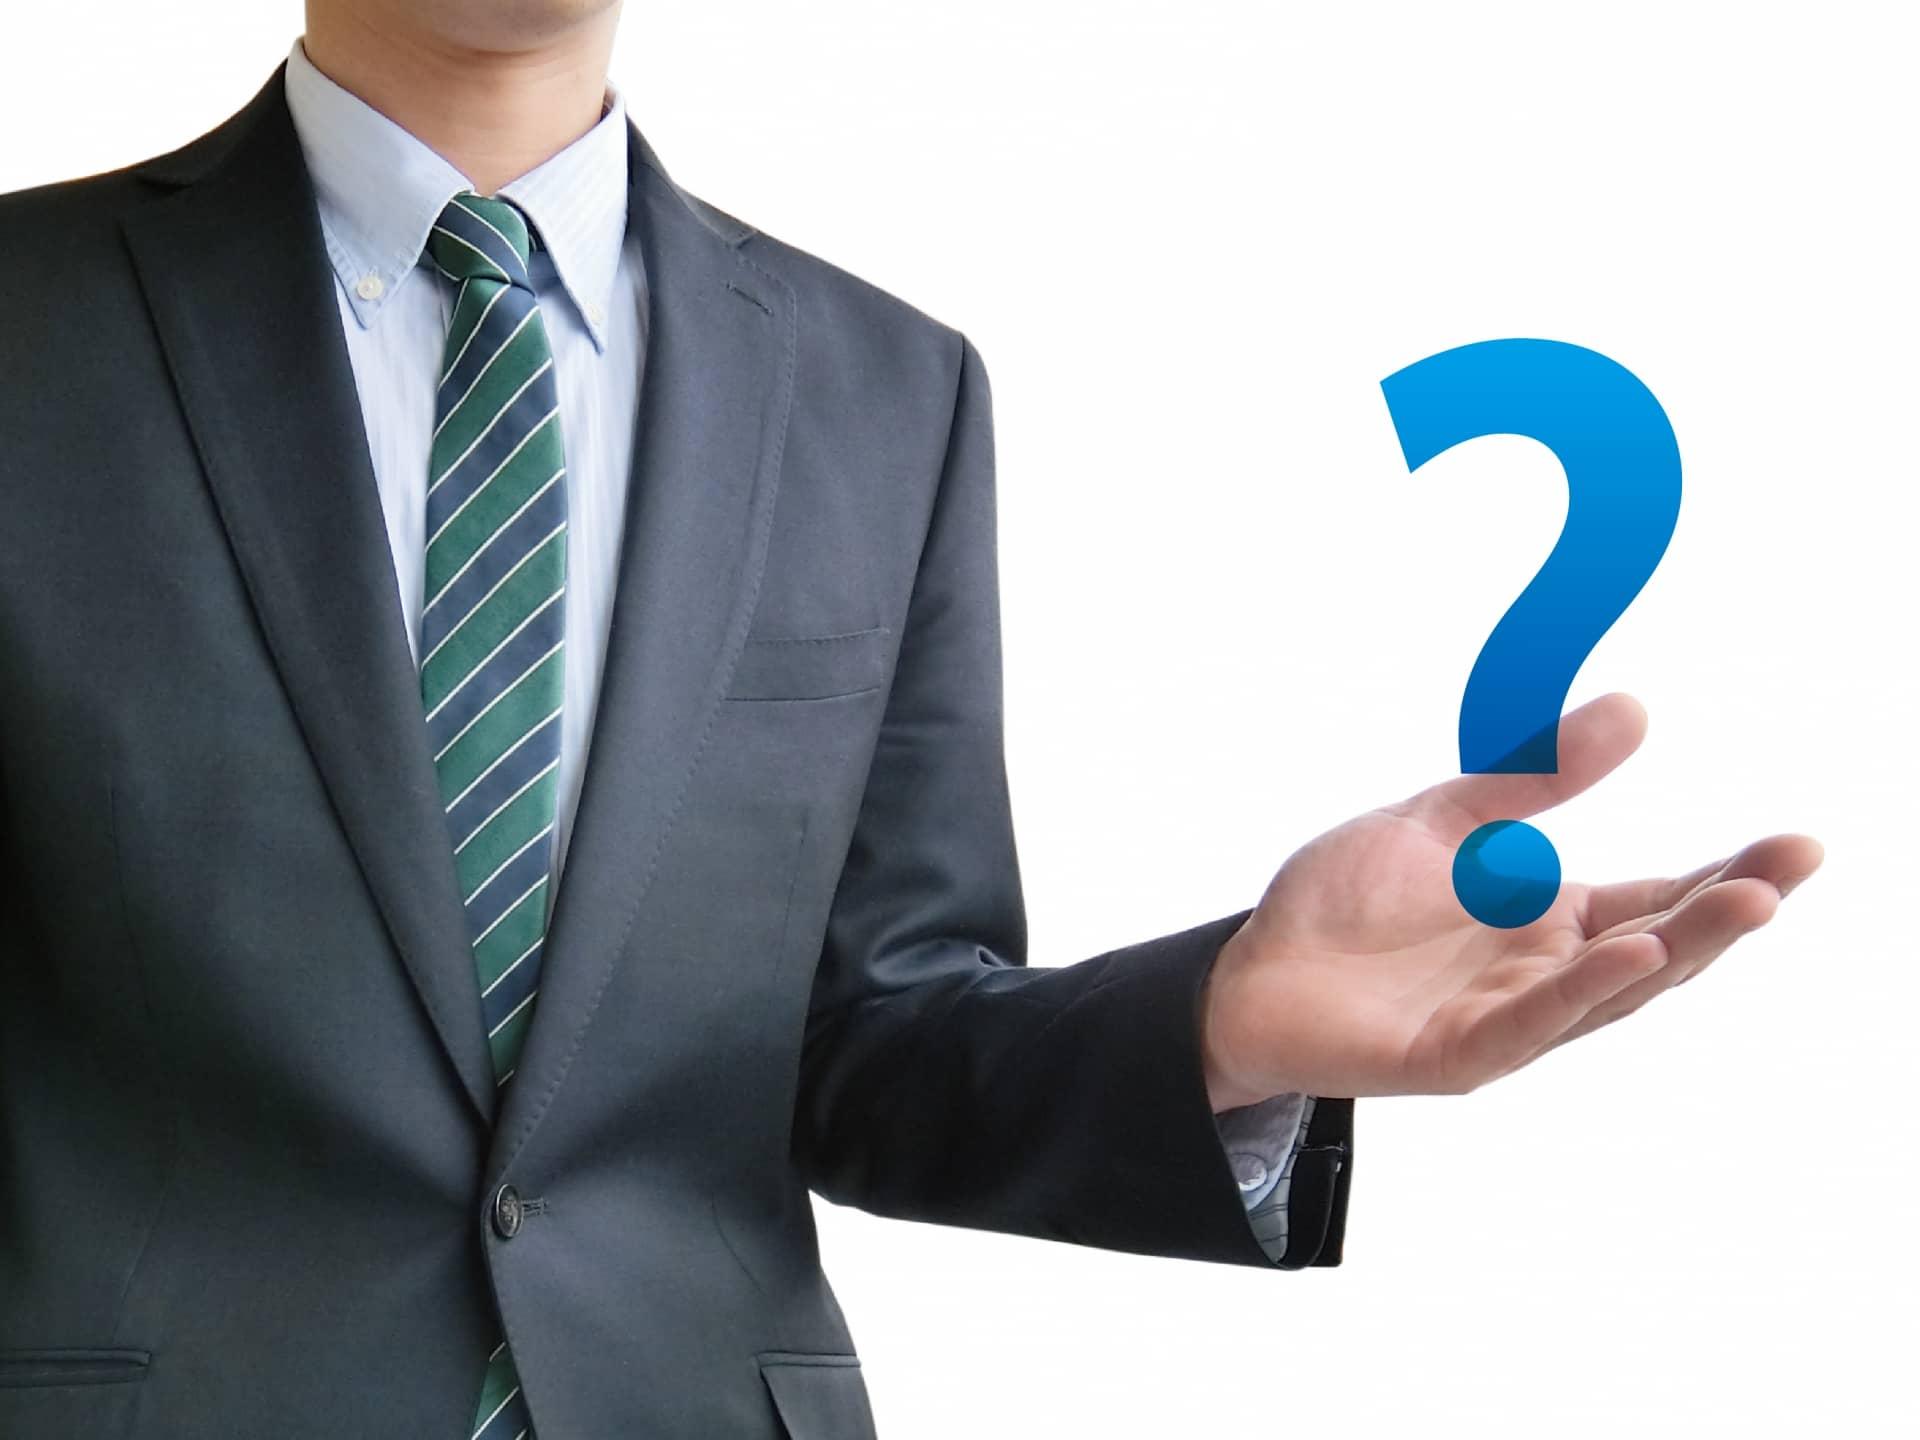 裁判外紛争解決手続(ADR) とは?【同一労働同一賃金】